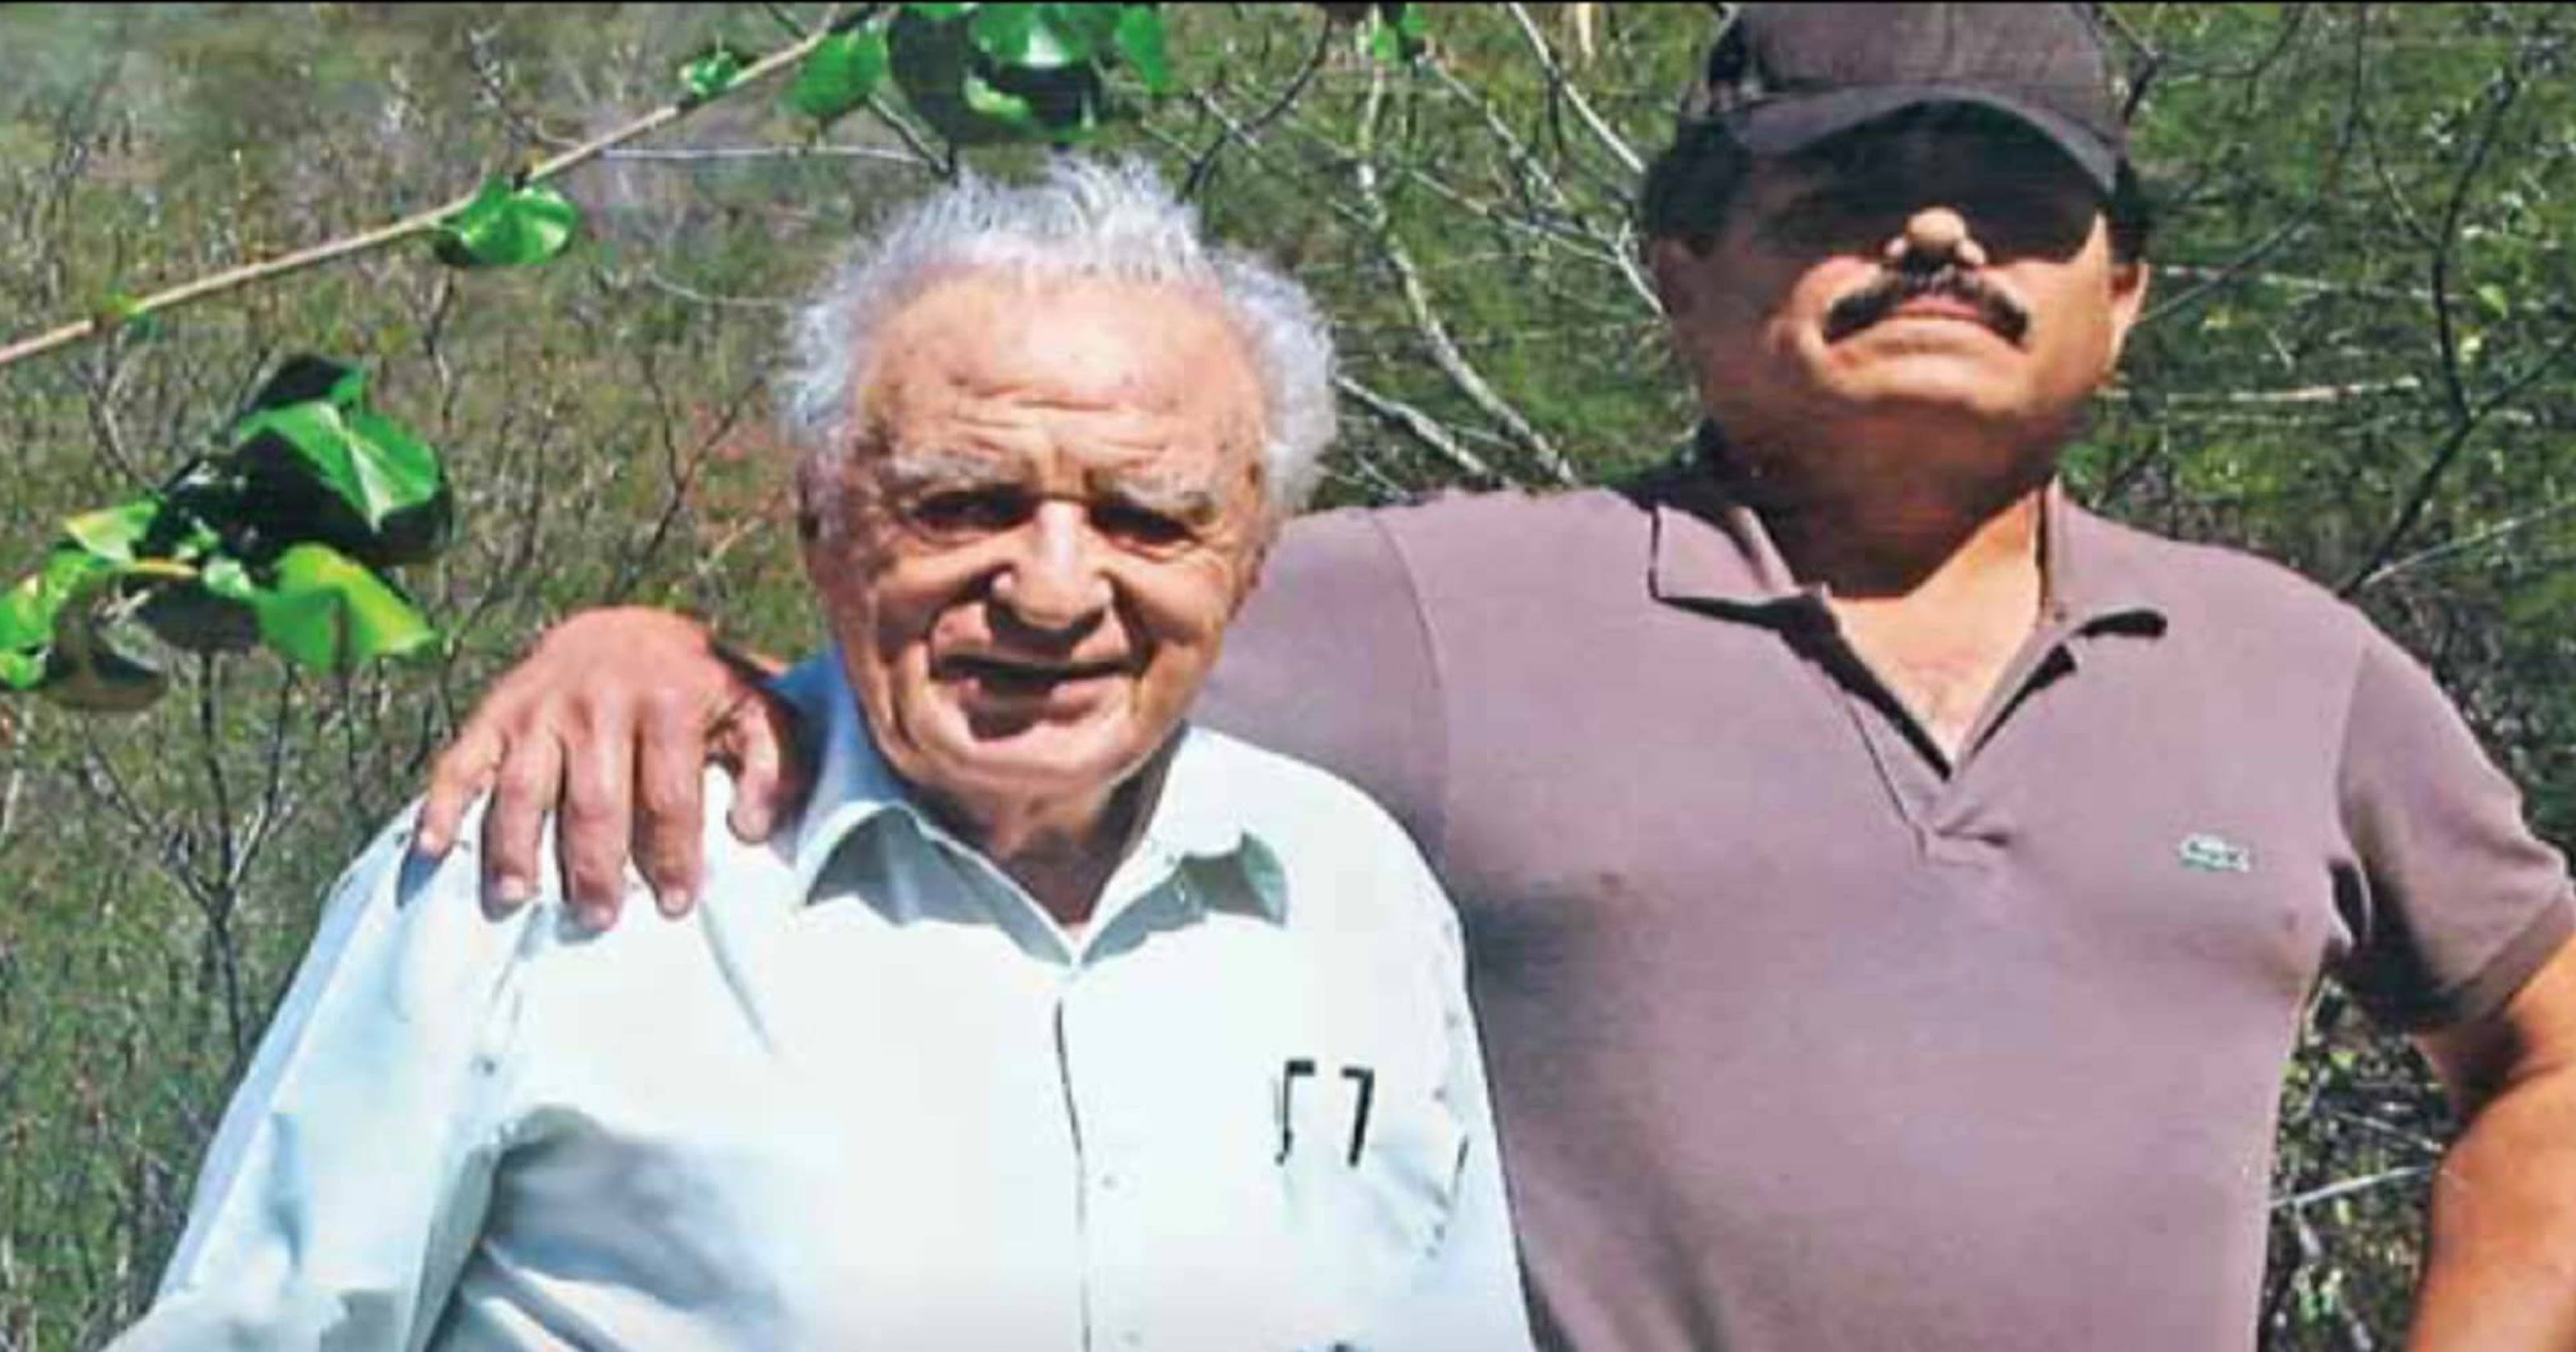 Chapo trial: Ismael Zambada Garcia leads still powerful